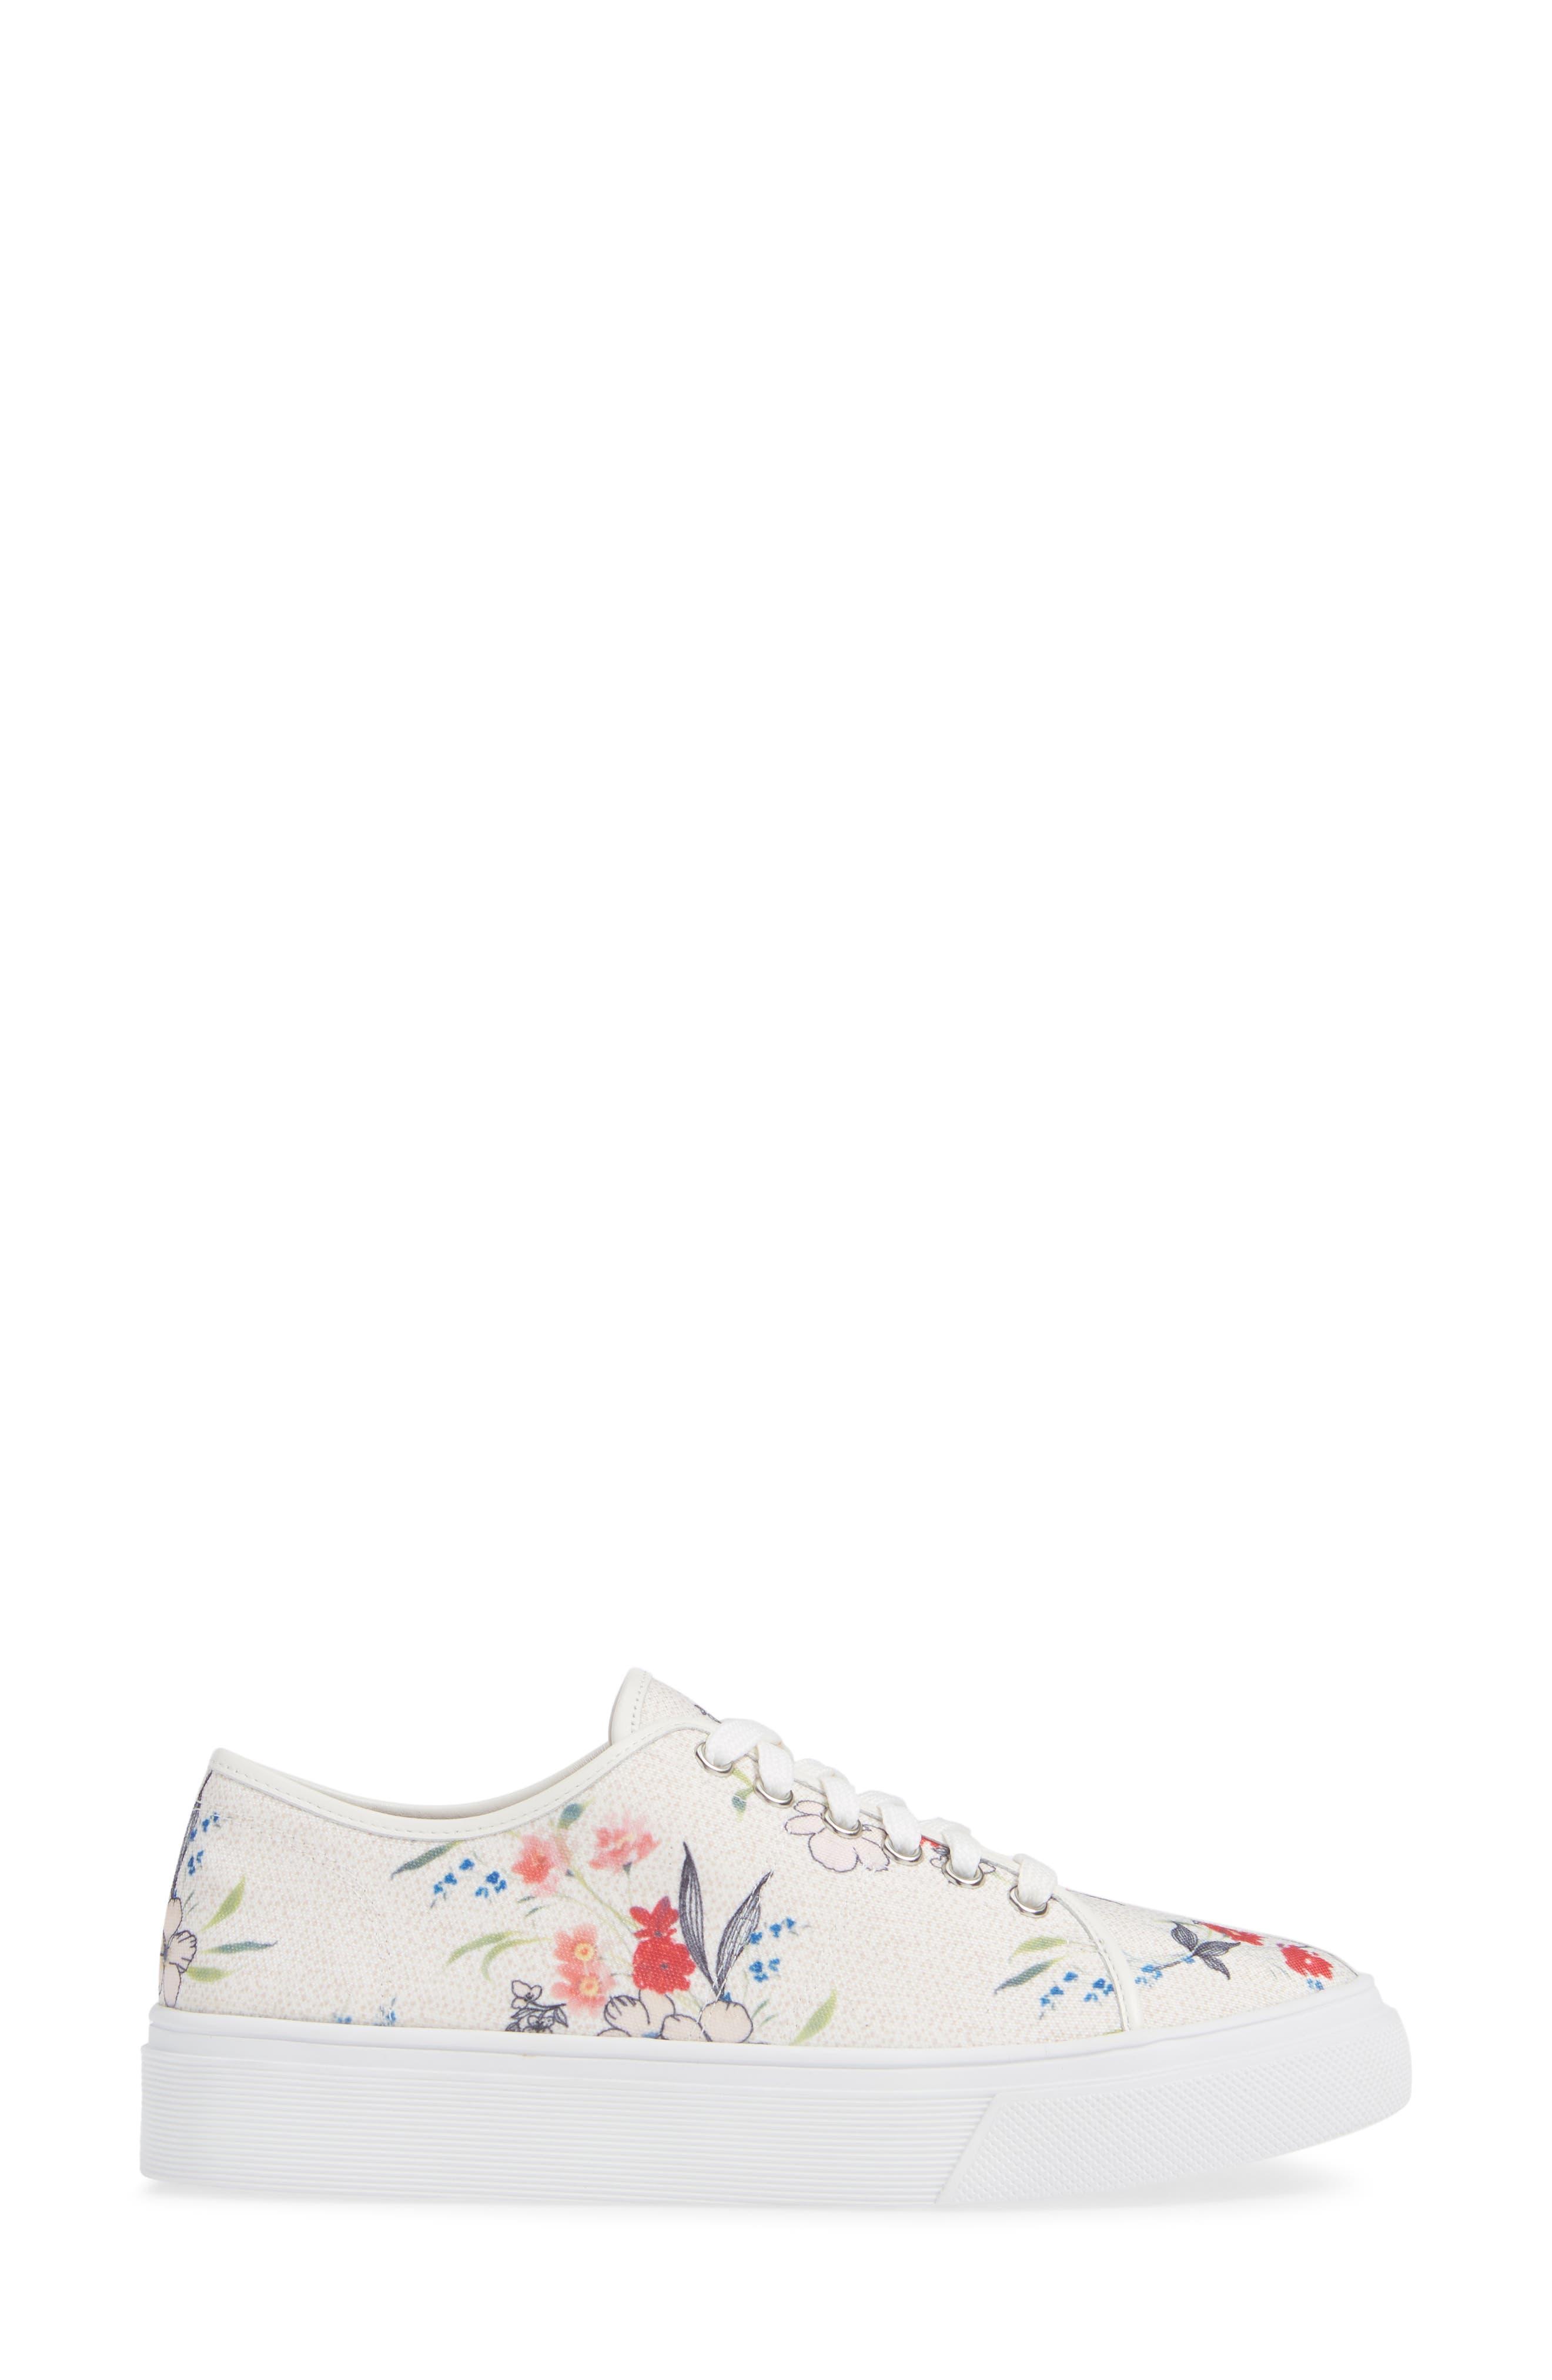 Ethan Low-Top Sneaker,                             Alternate thumbnail 3, color,                             WHITE FLORAL CANVAS